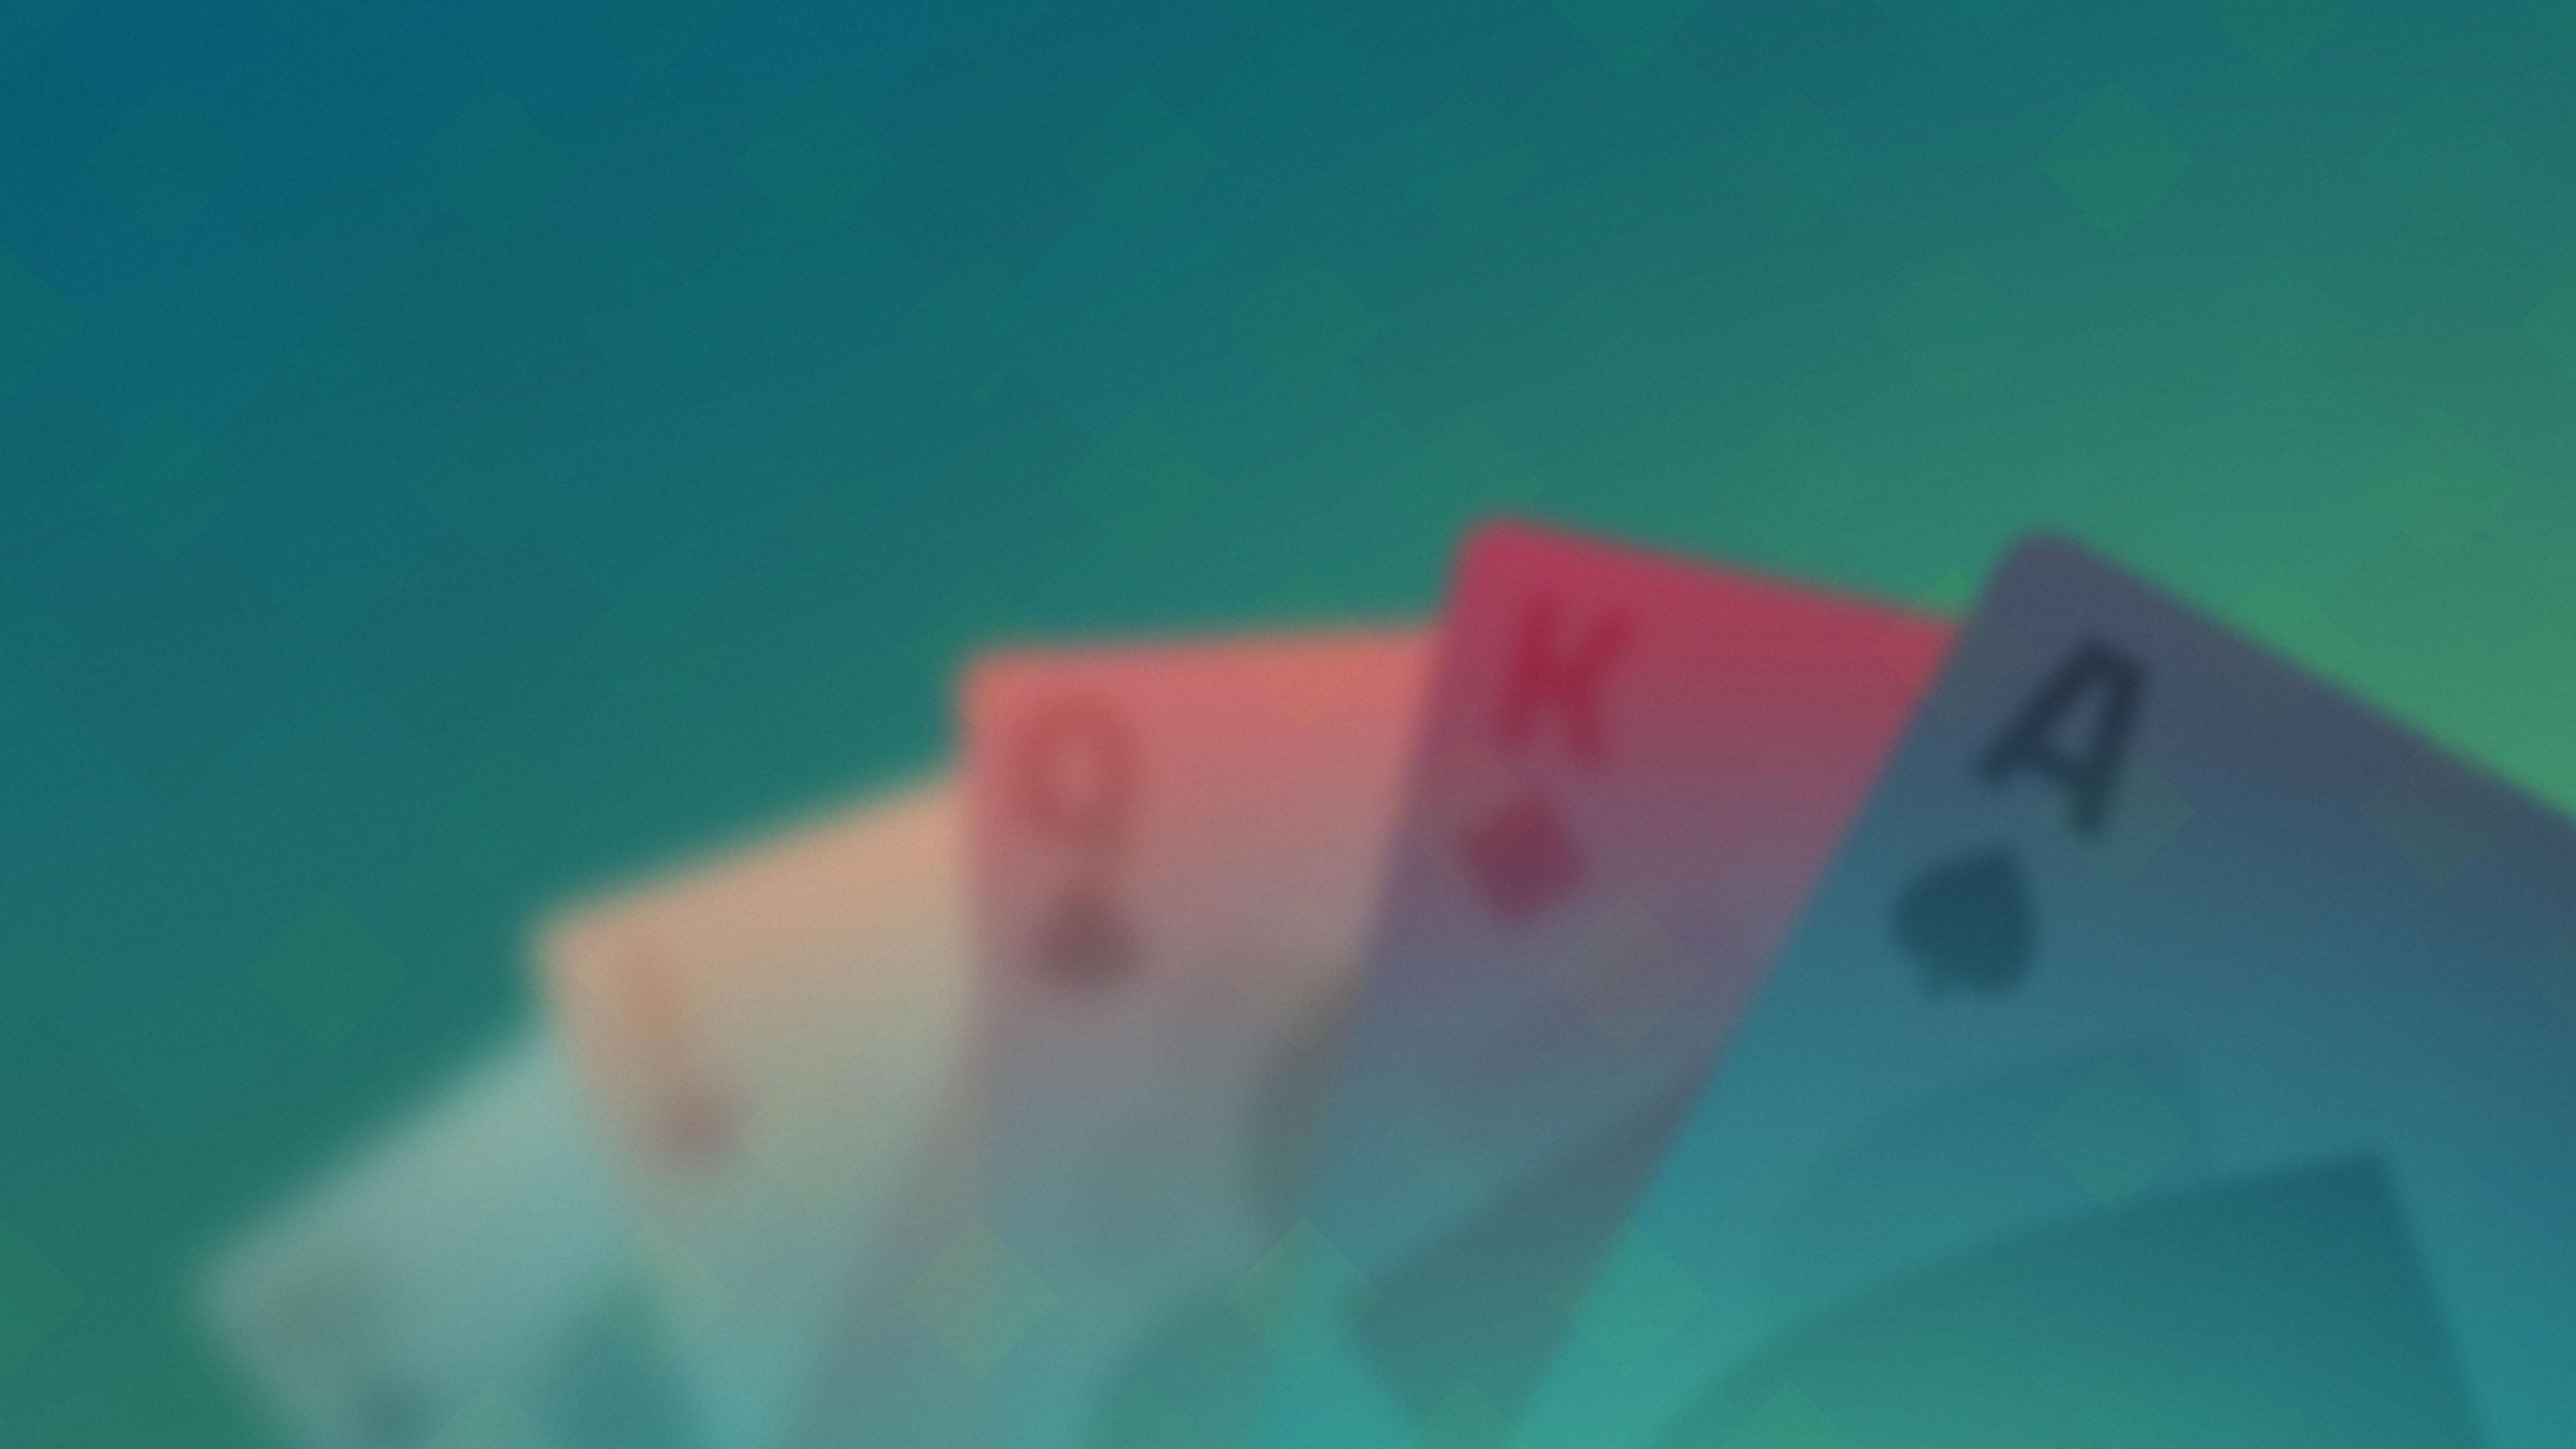 Poker Wallpaper By Monter On Dribbble